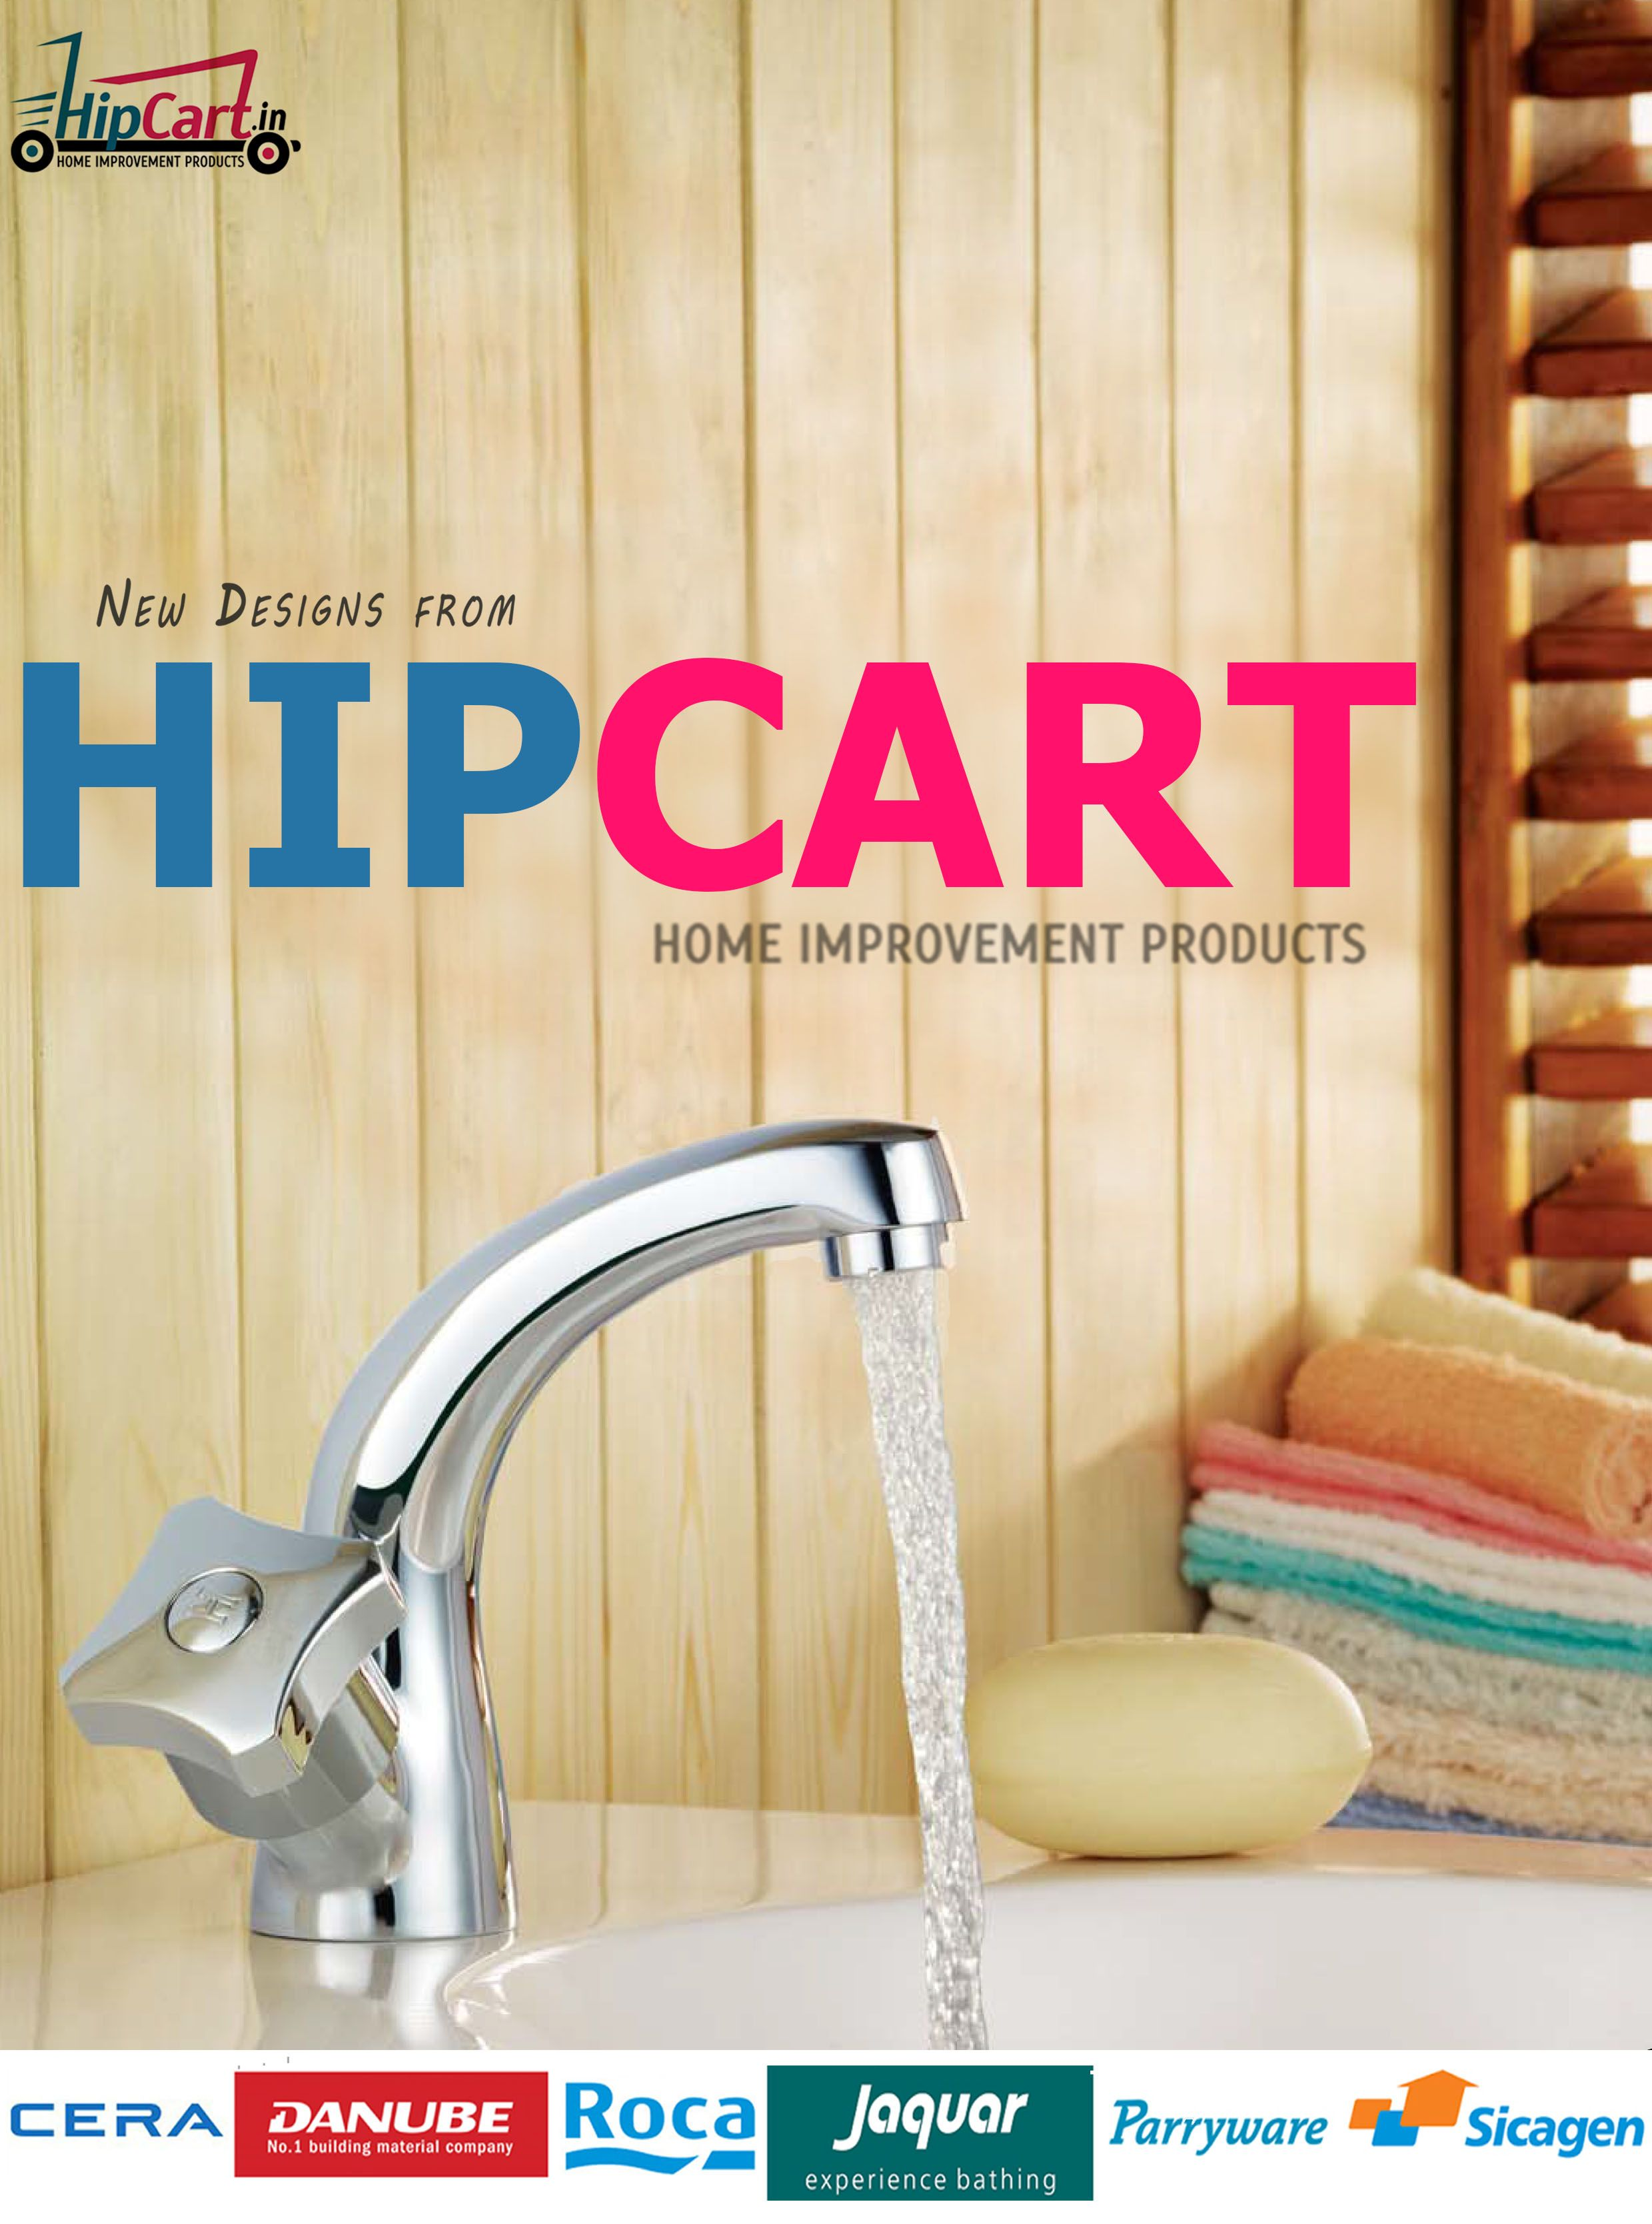 Explore New Designs From Hipcart Home Improvement Design